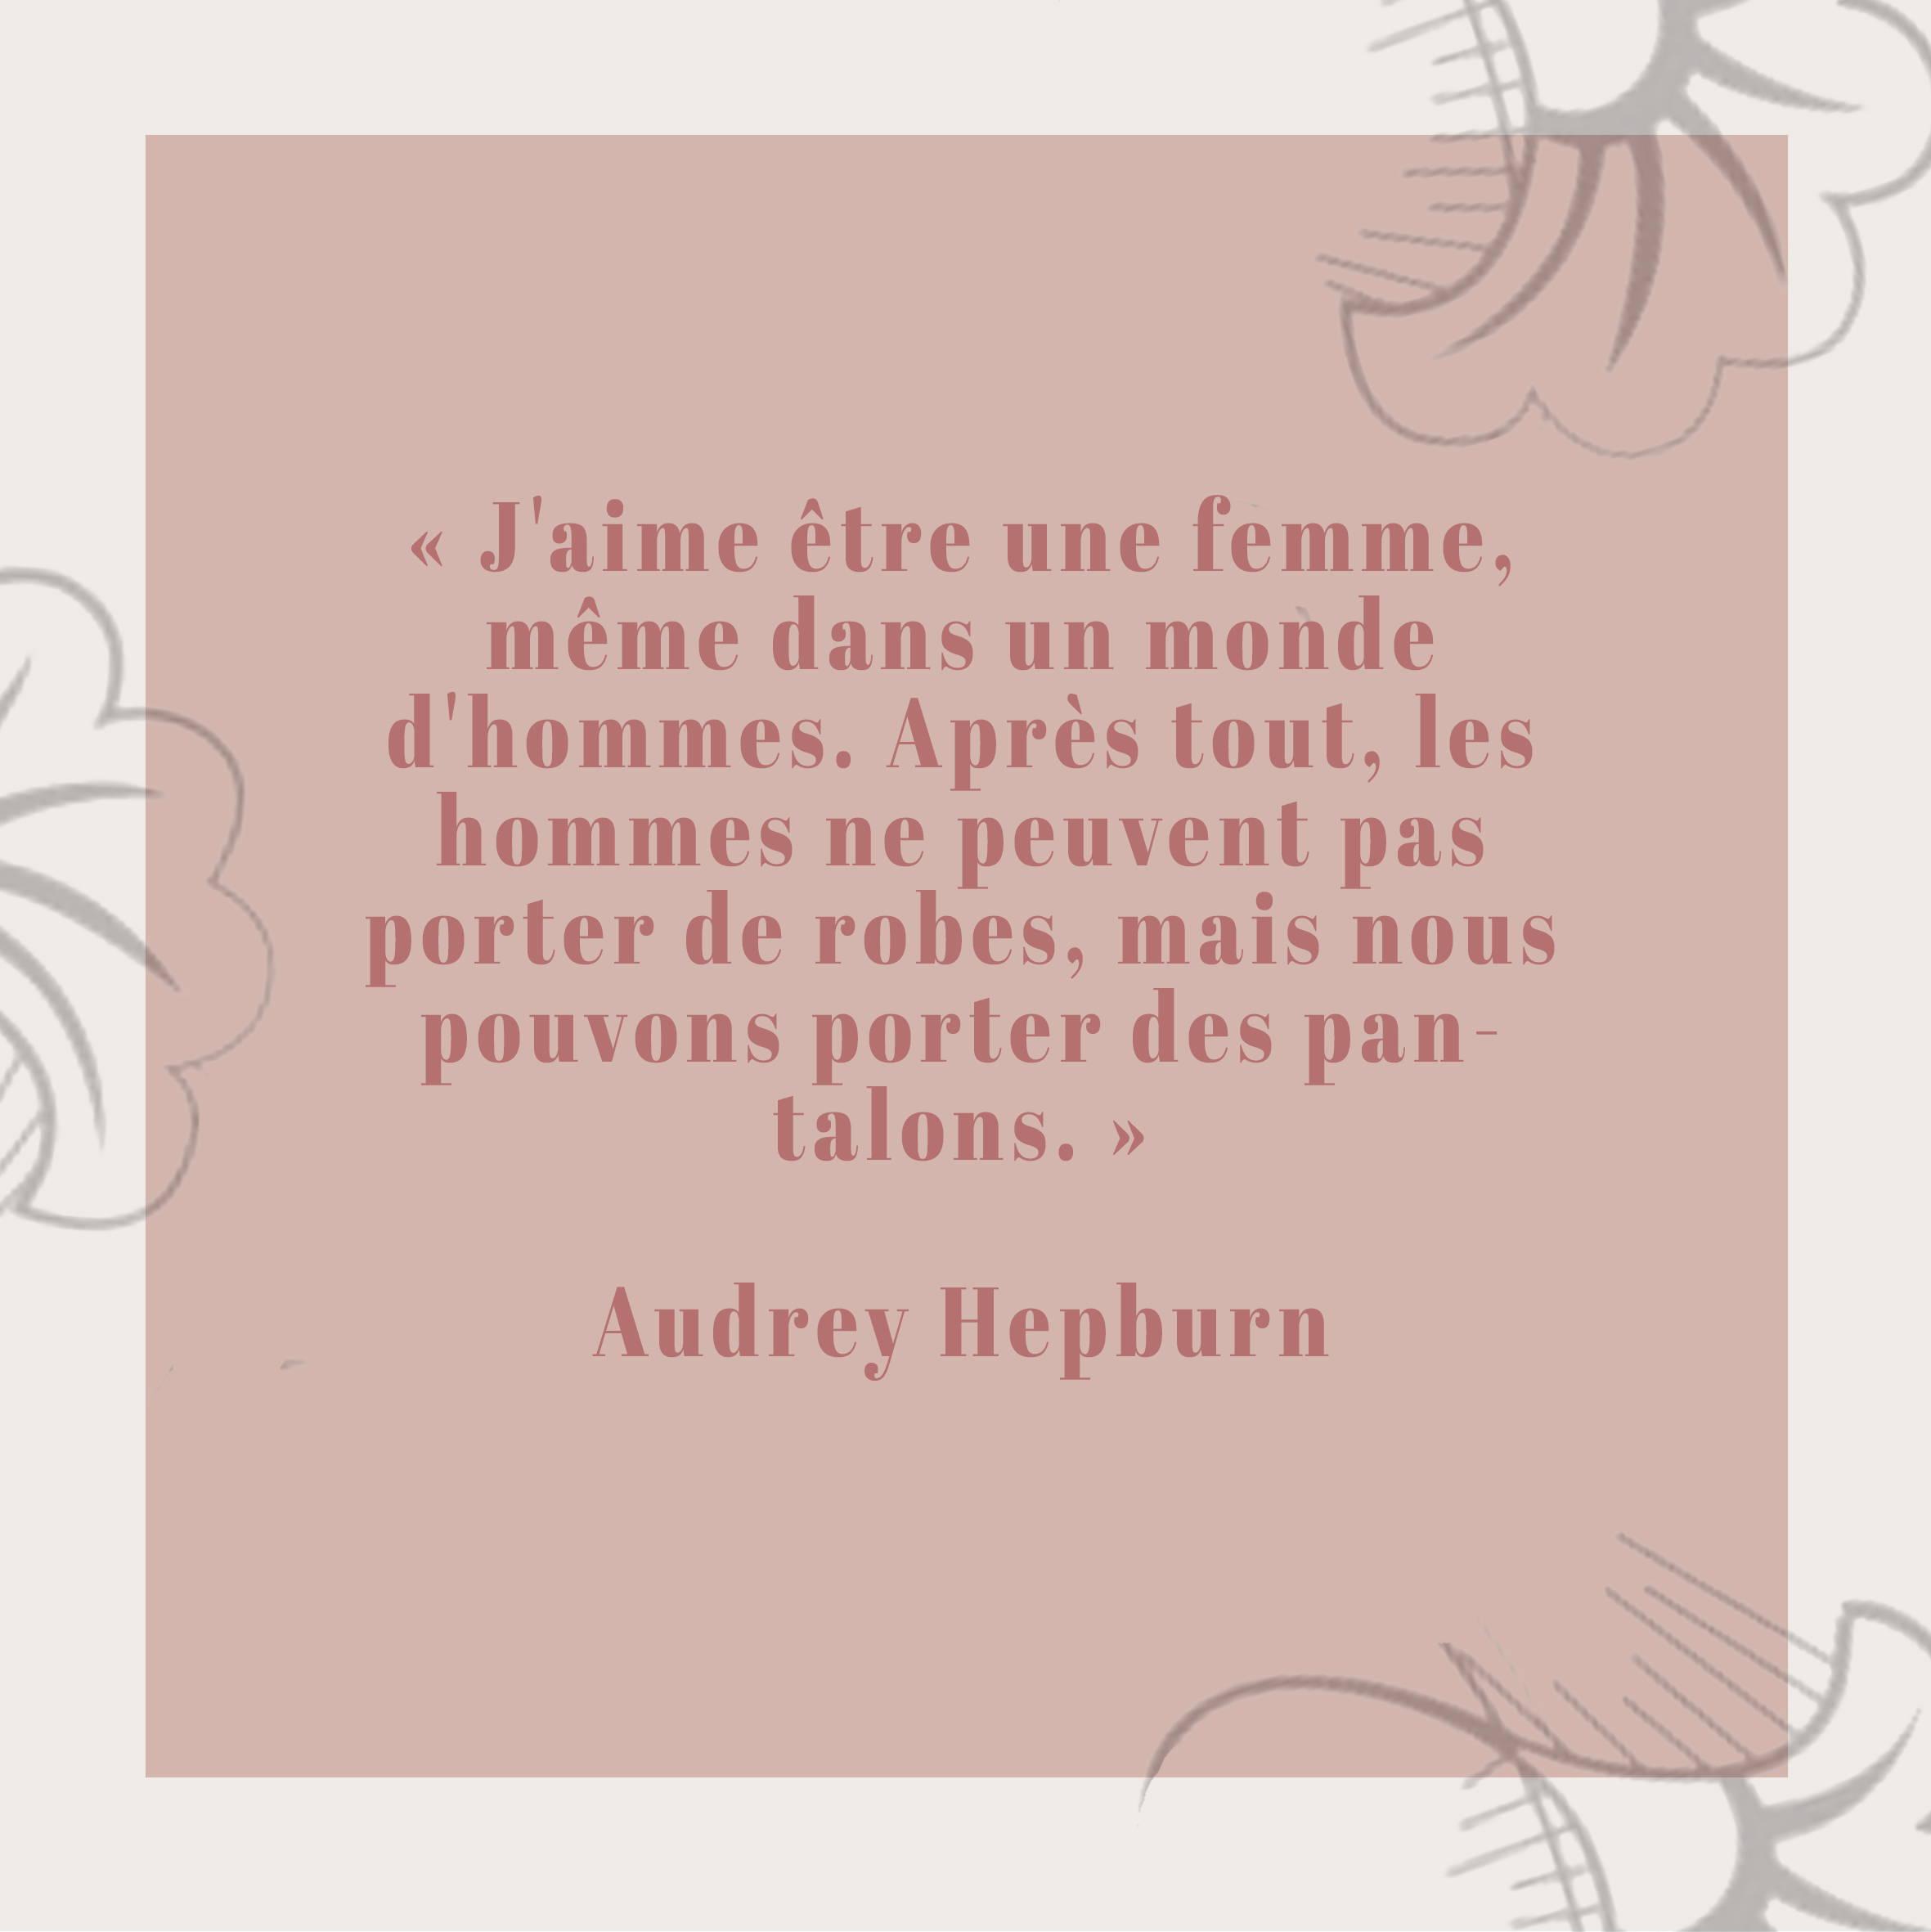 citation audrey hepburn